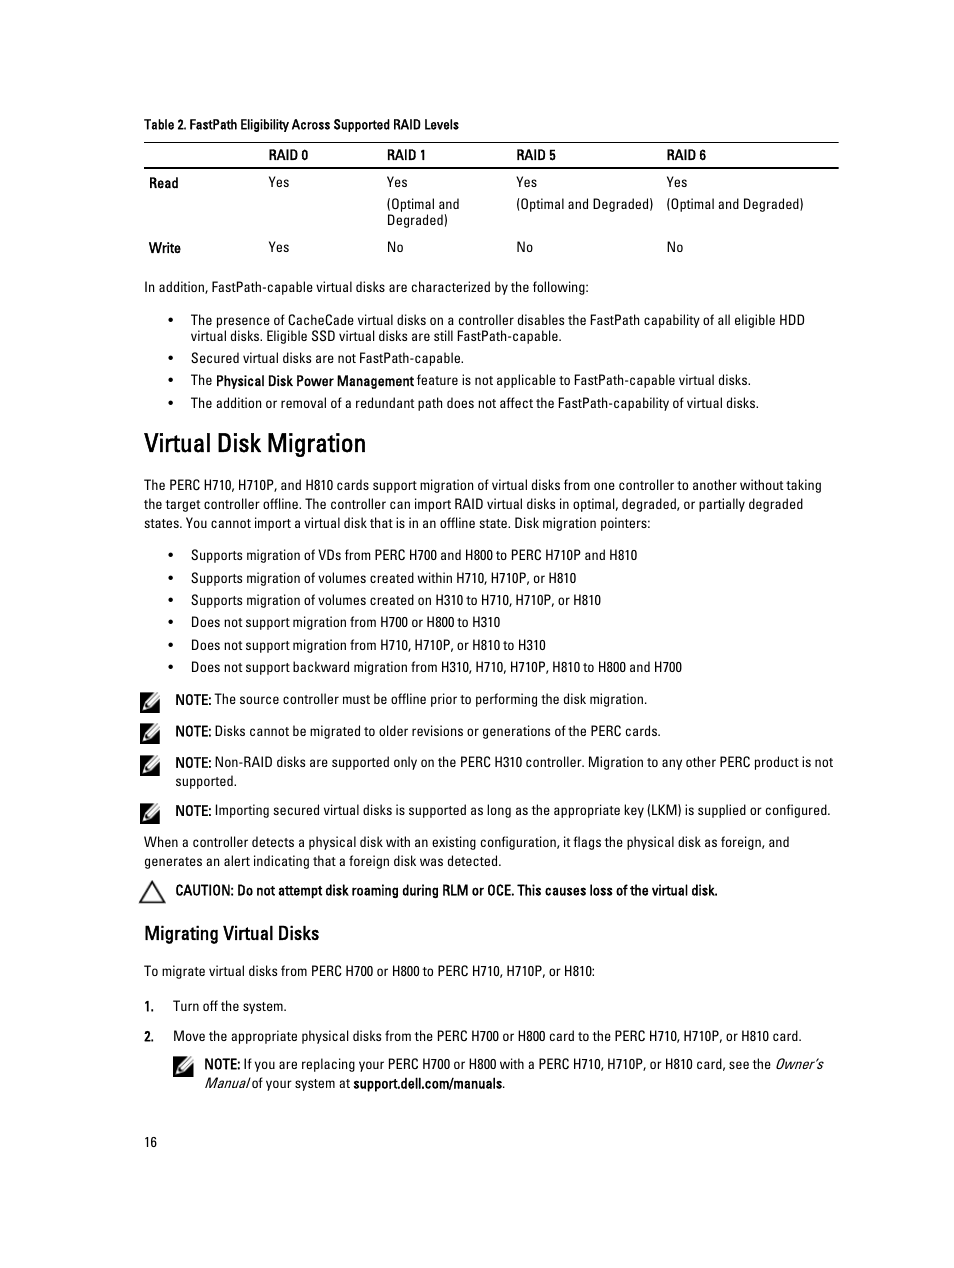 Virtual disk migration, Migrating virtual disks   Dell